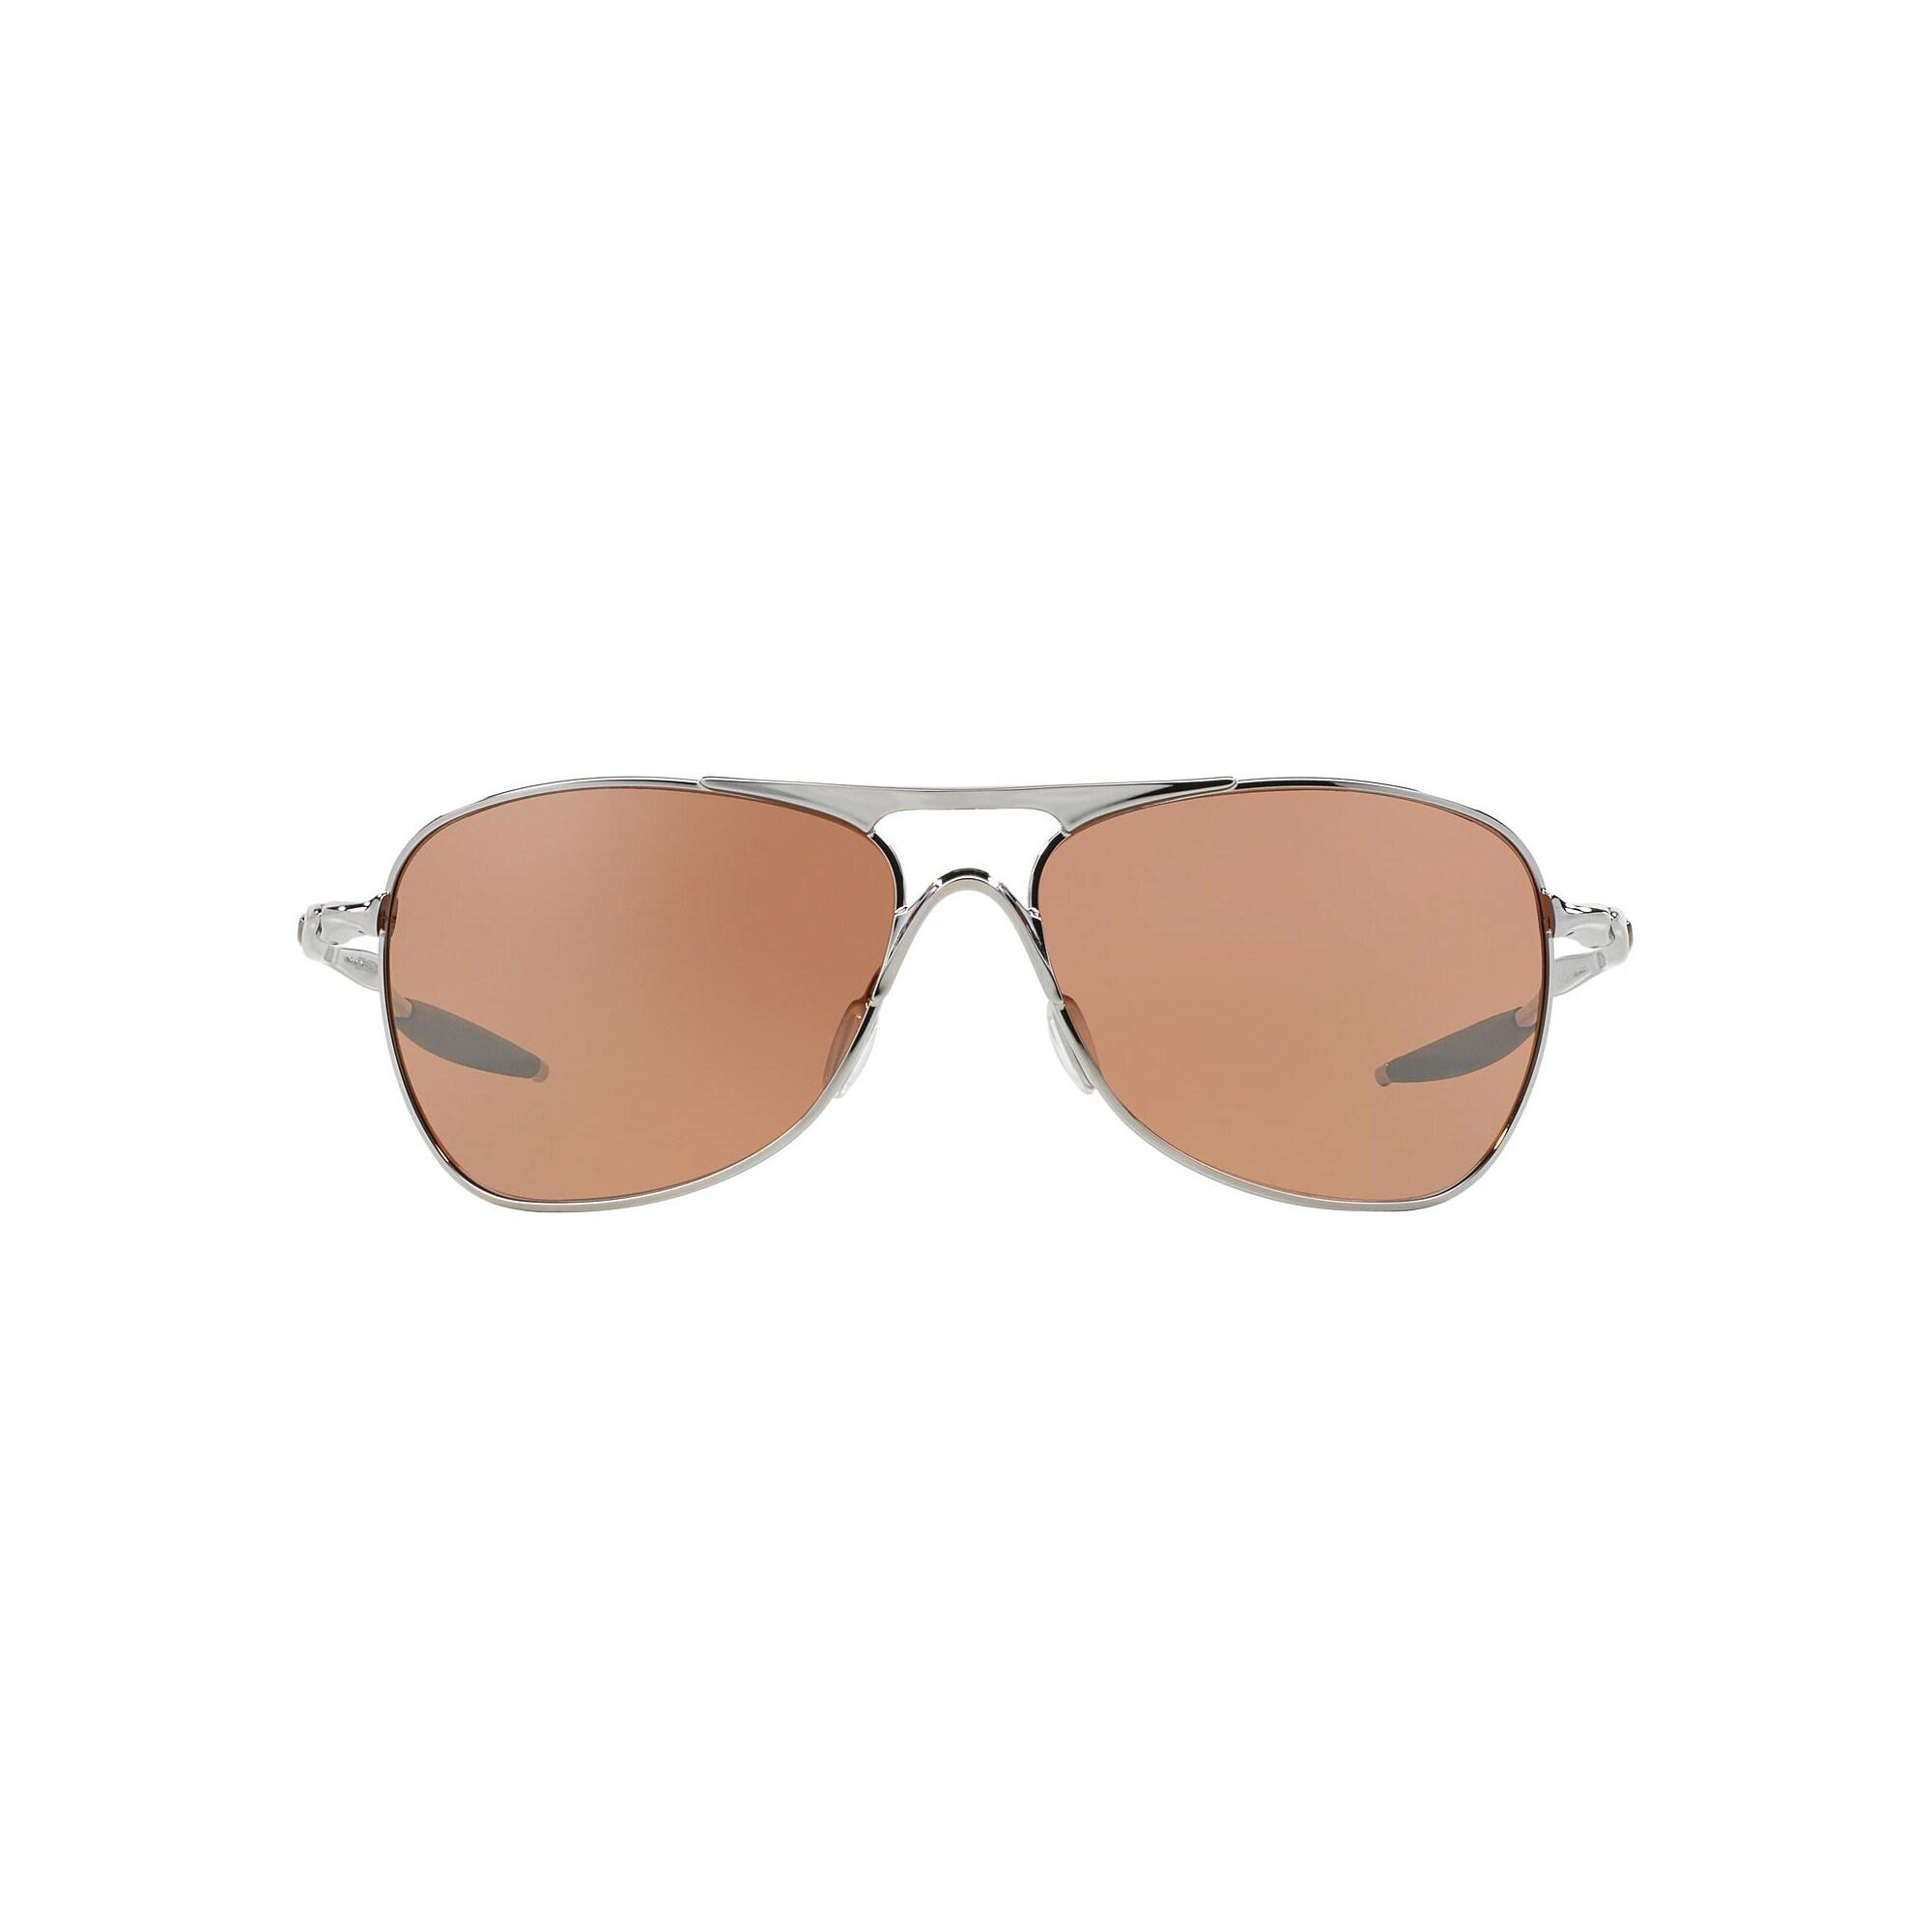 a990da5f0b Shop Oakley Crosshair Sunglasses Chrome  Black Iridium 61mm - Silver - Free  Shipping Today - Overstock - 14791140